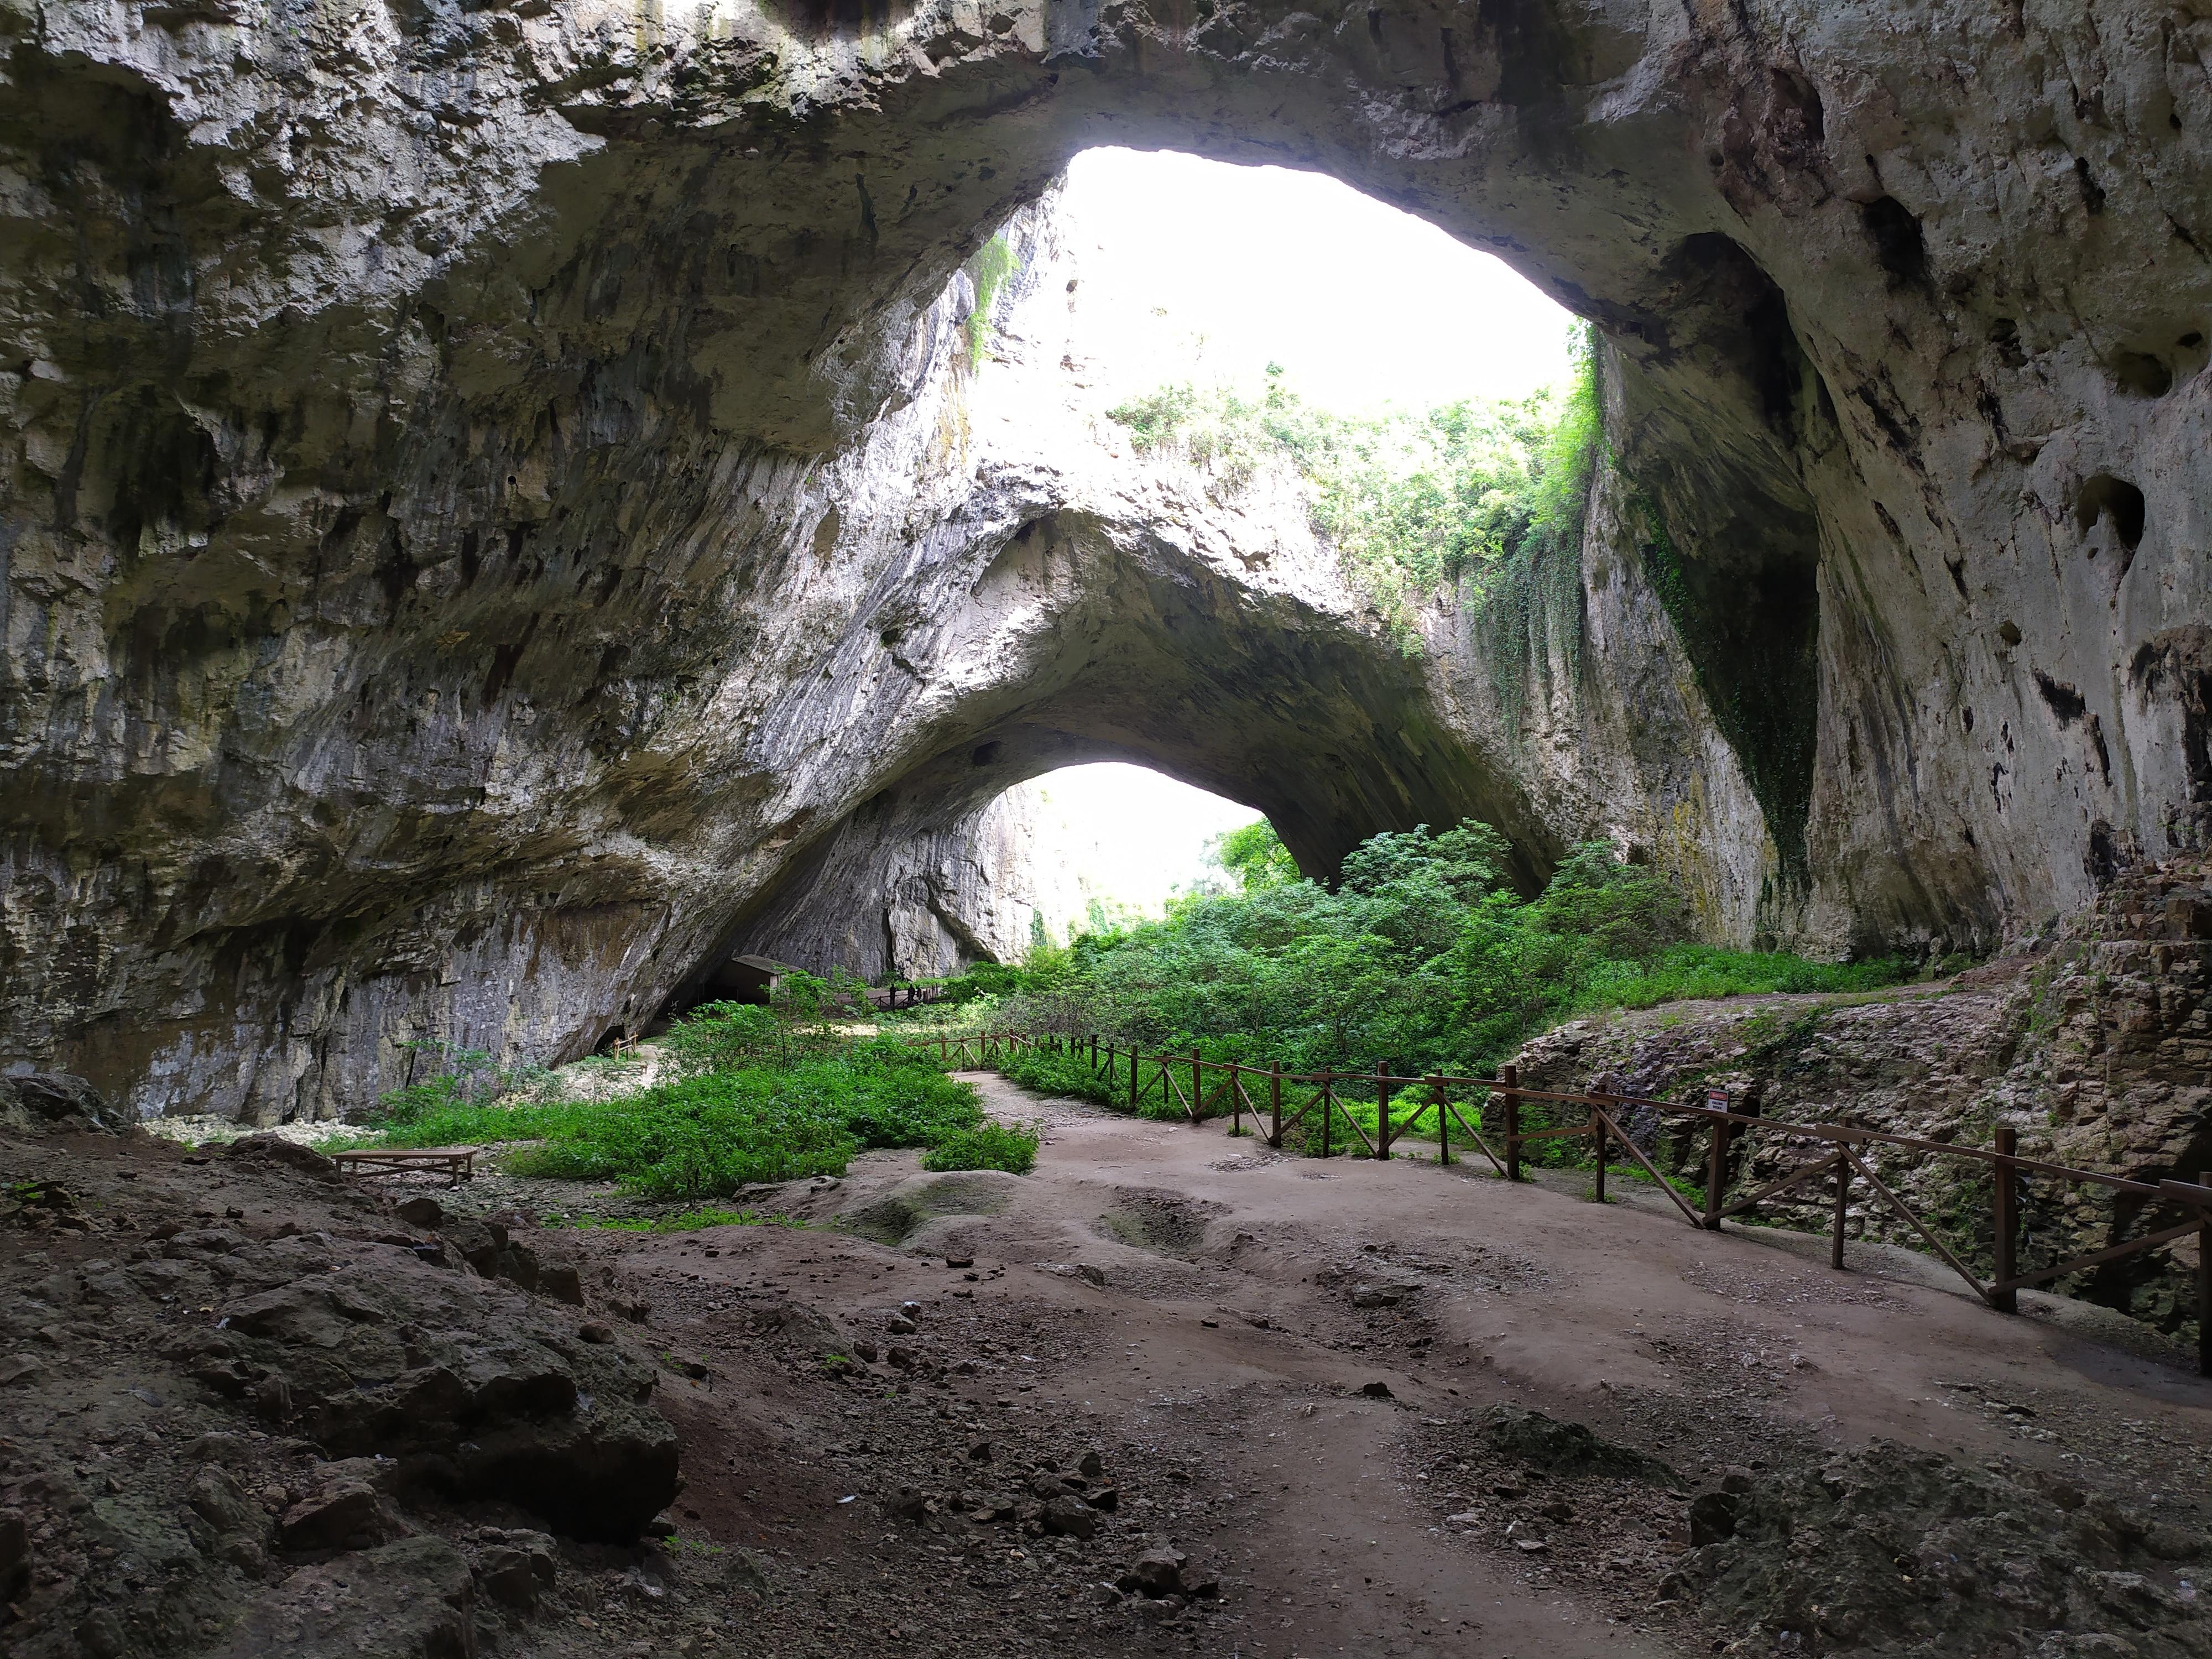 Lovech, Devetaki Cave & Krushuna Waterfalls 2